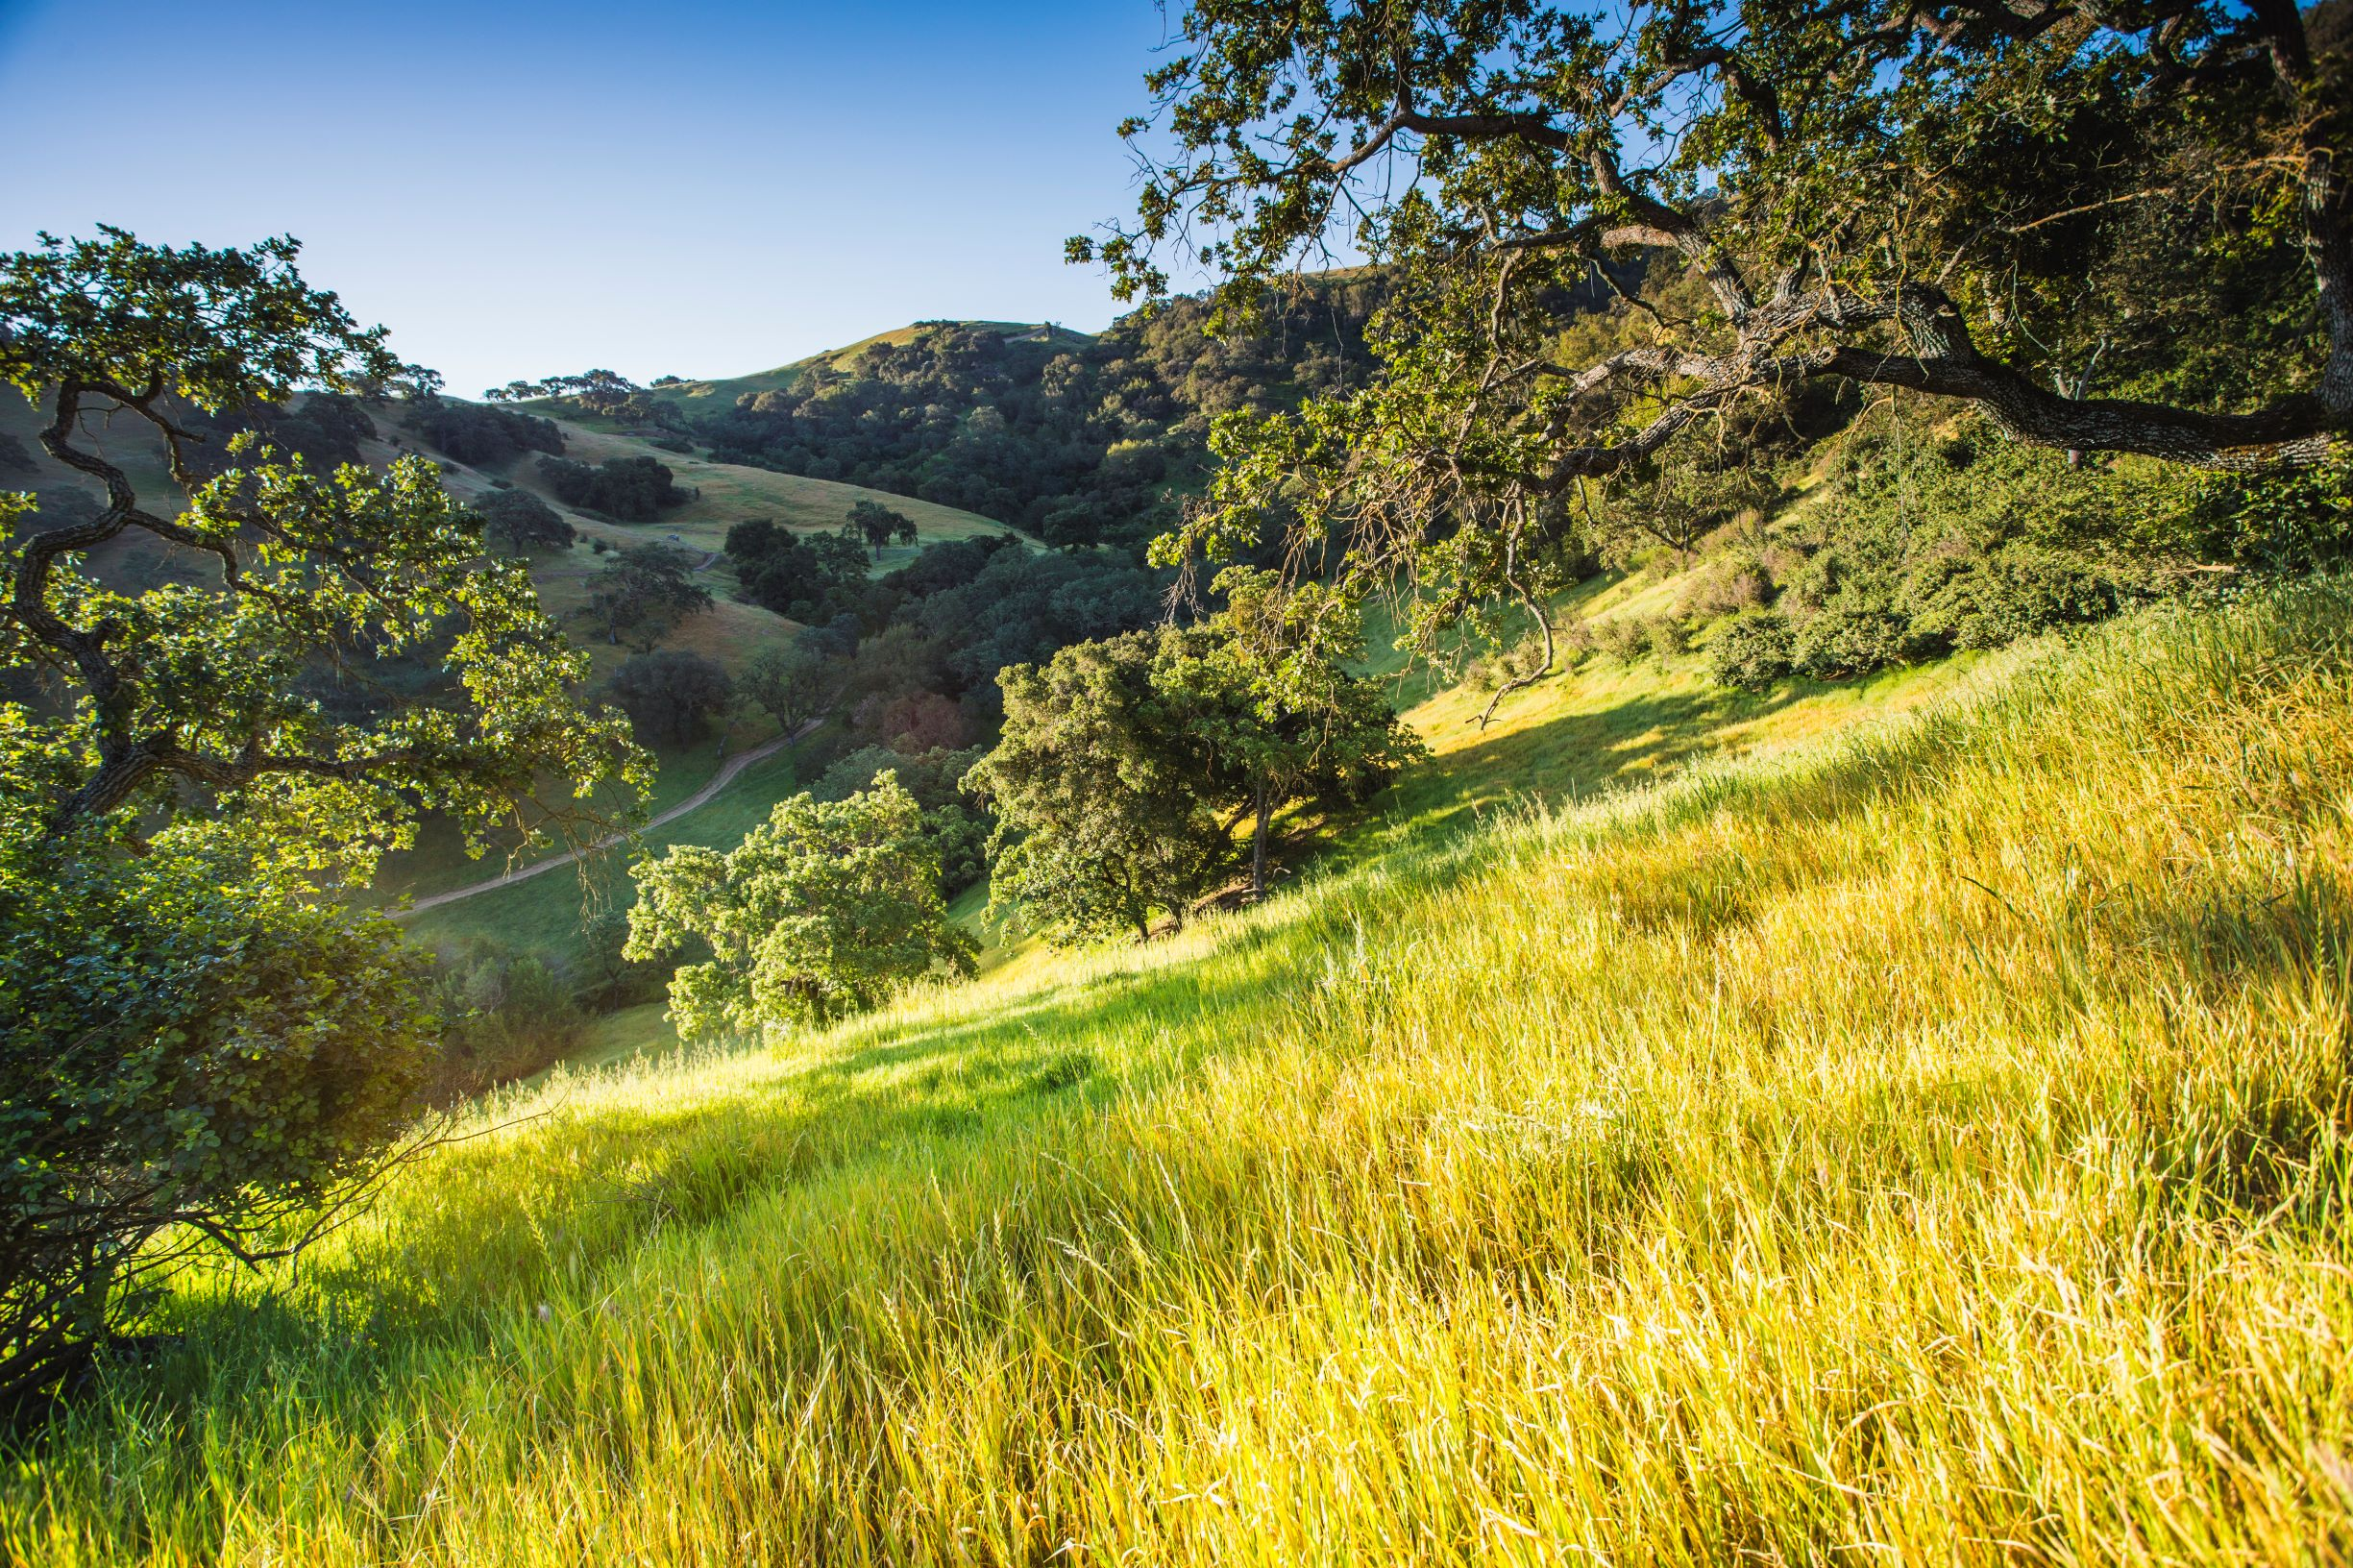 Coyote Valley Hillside